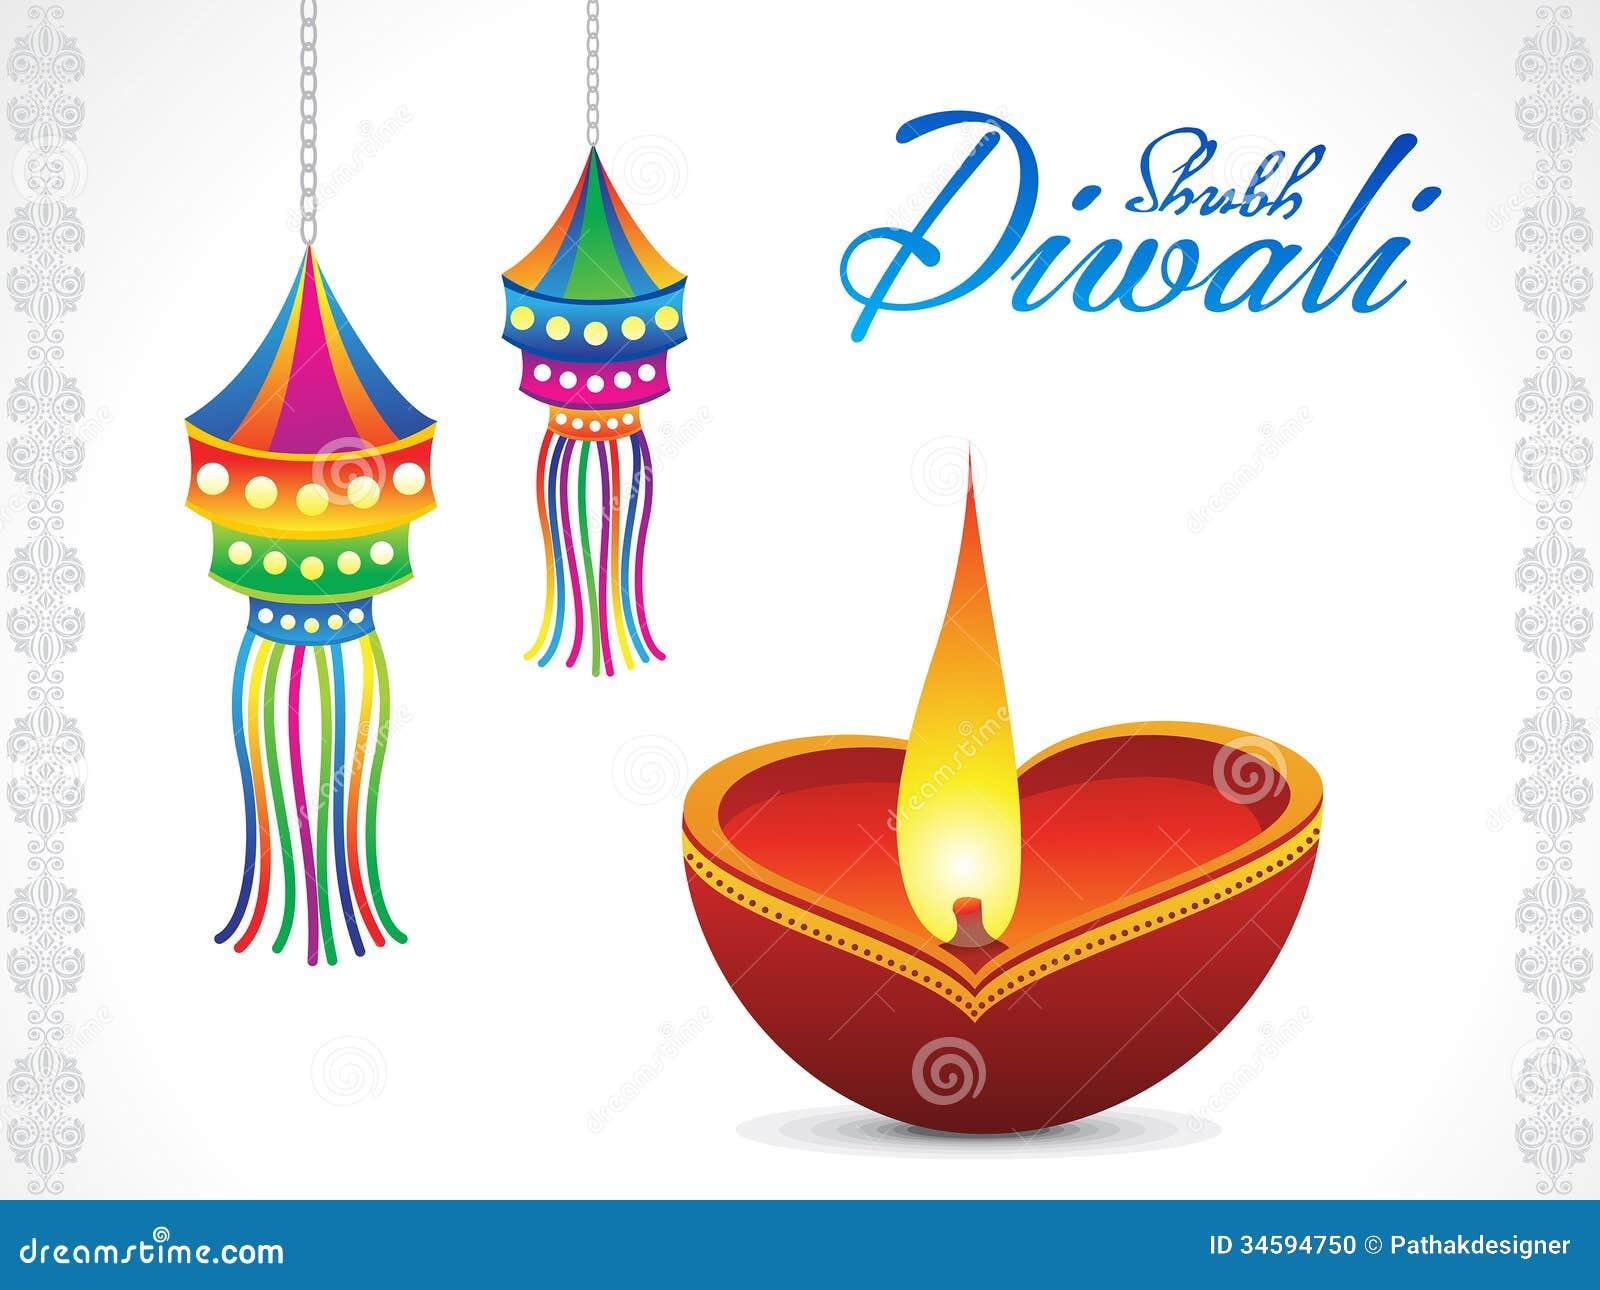 Diwali Vector Designs Free